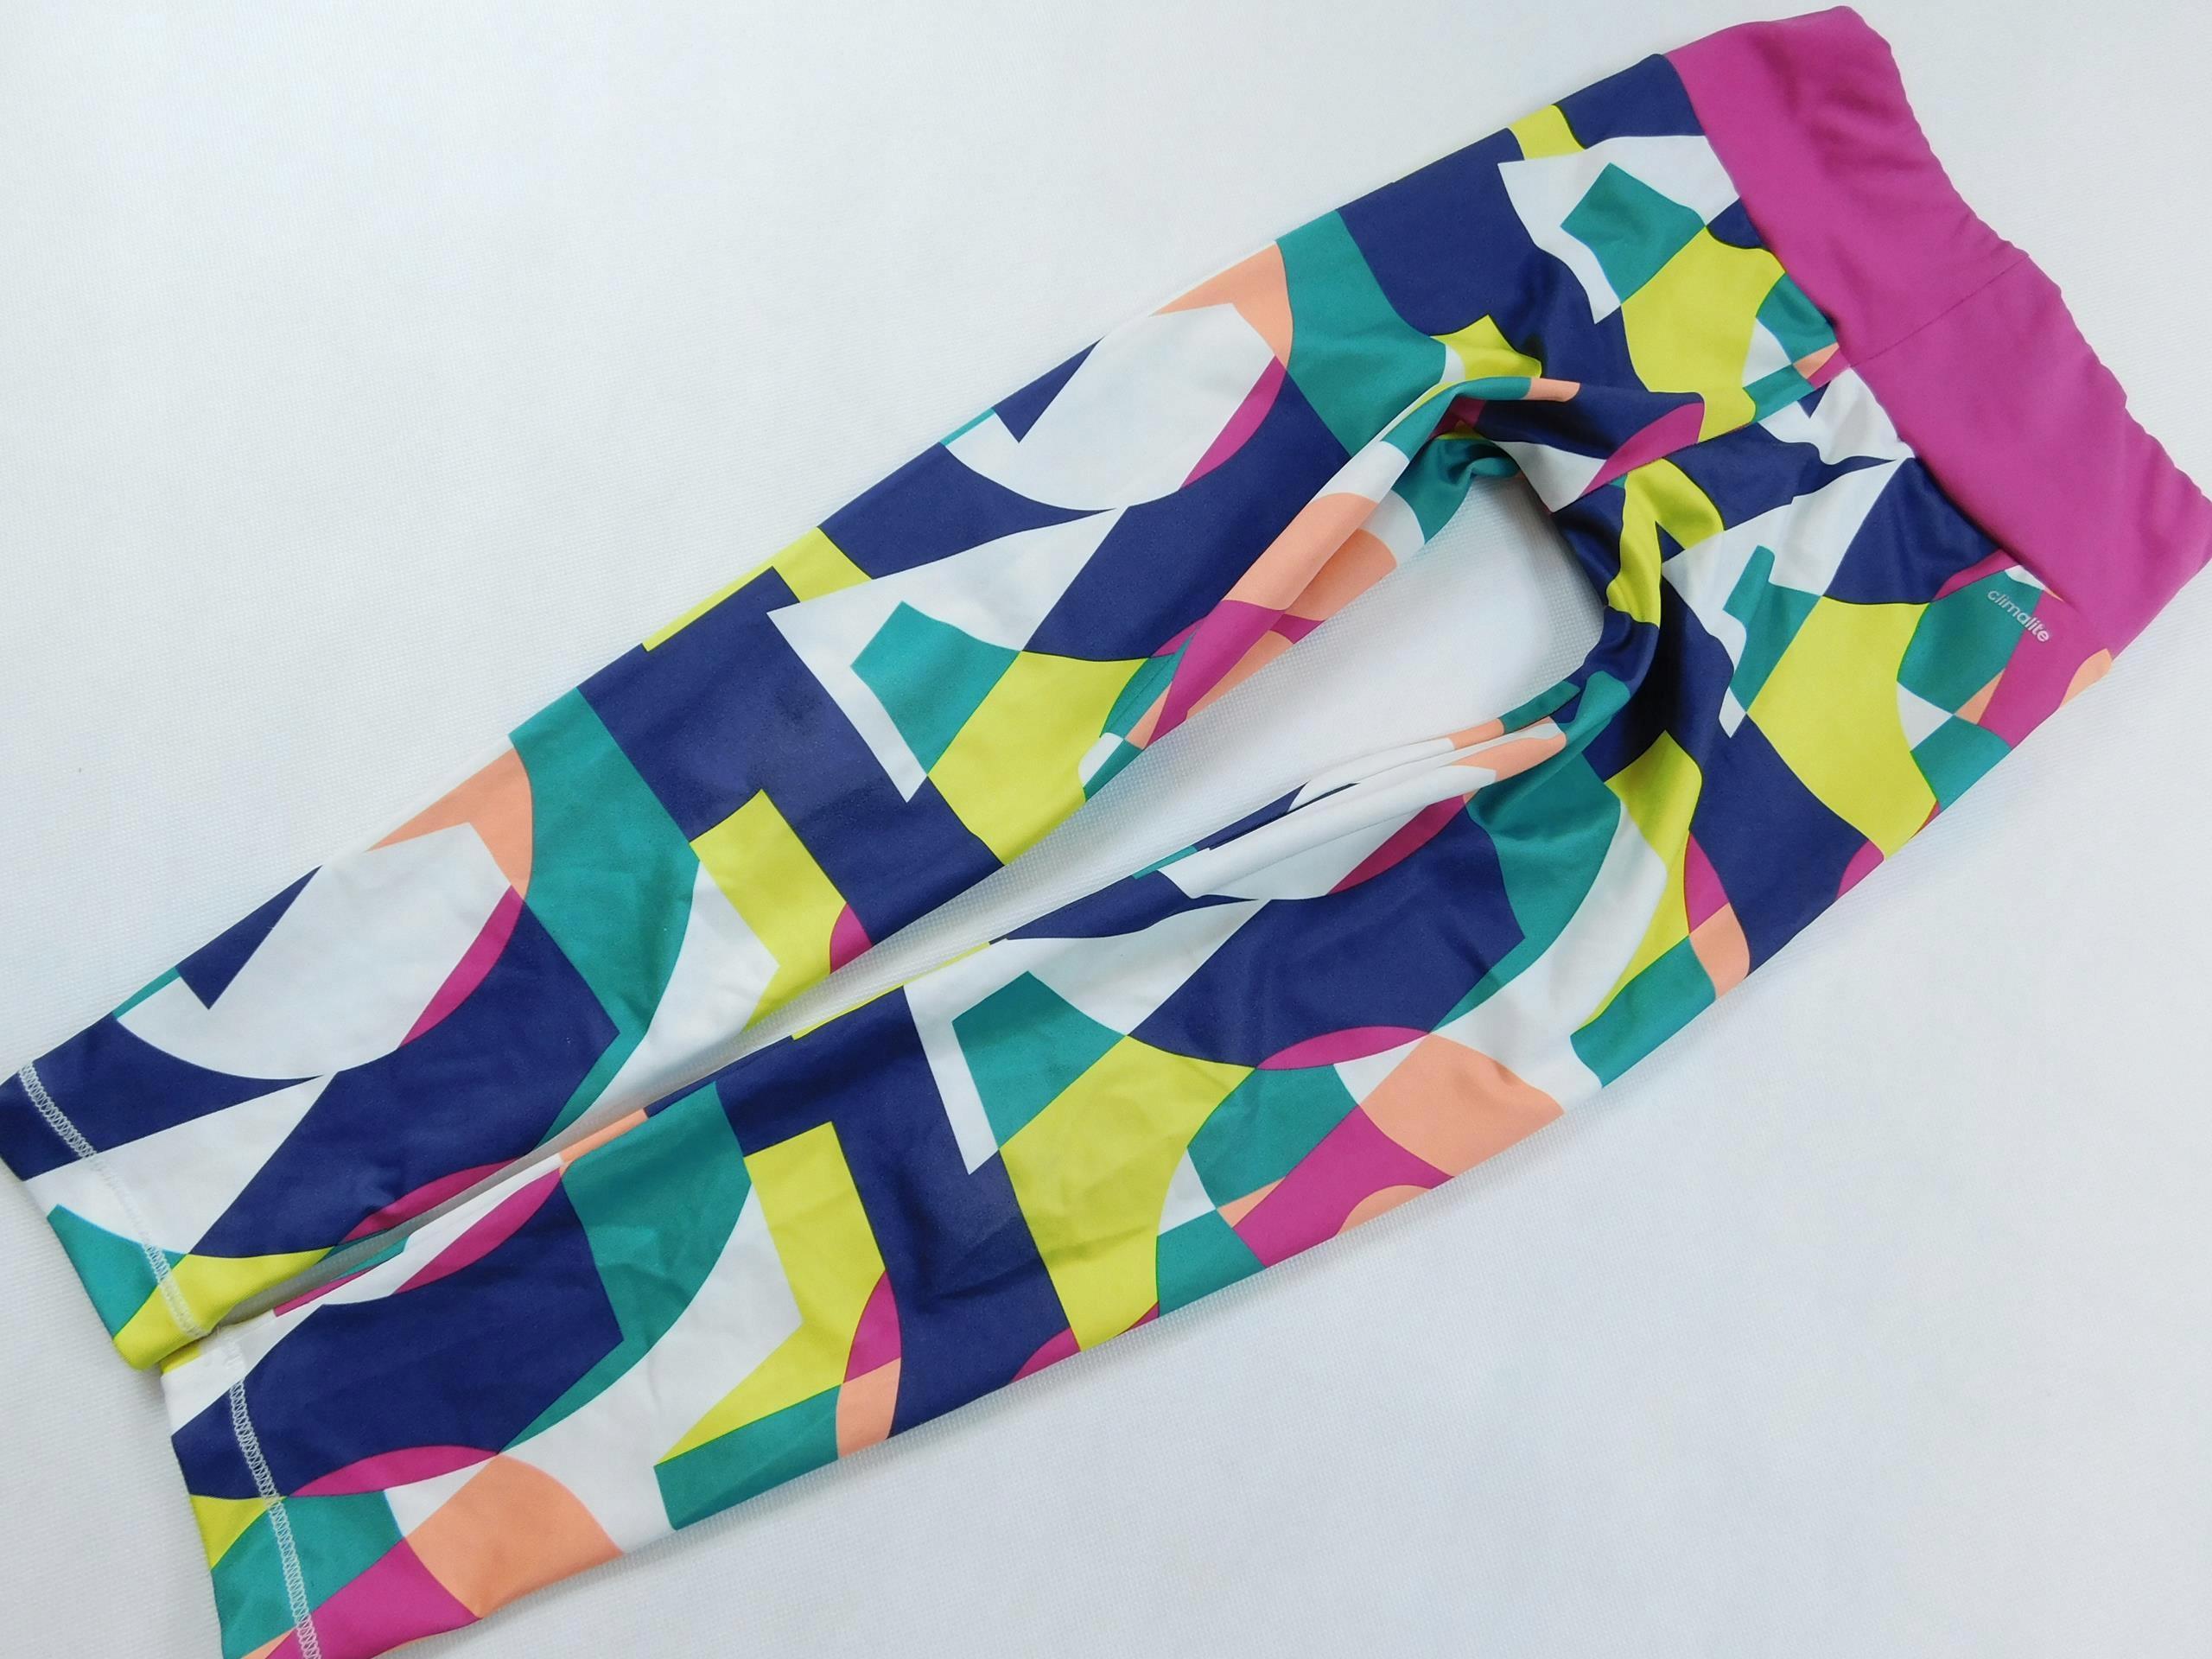 bluza adidas originals SST passaredo kolorowa 38 M